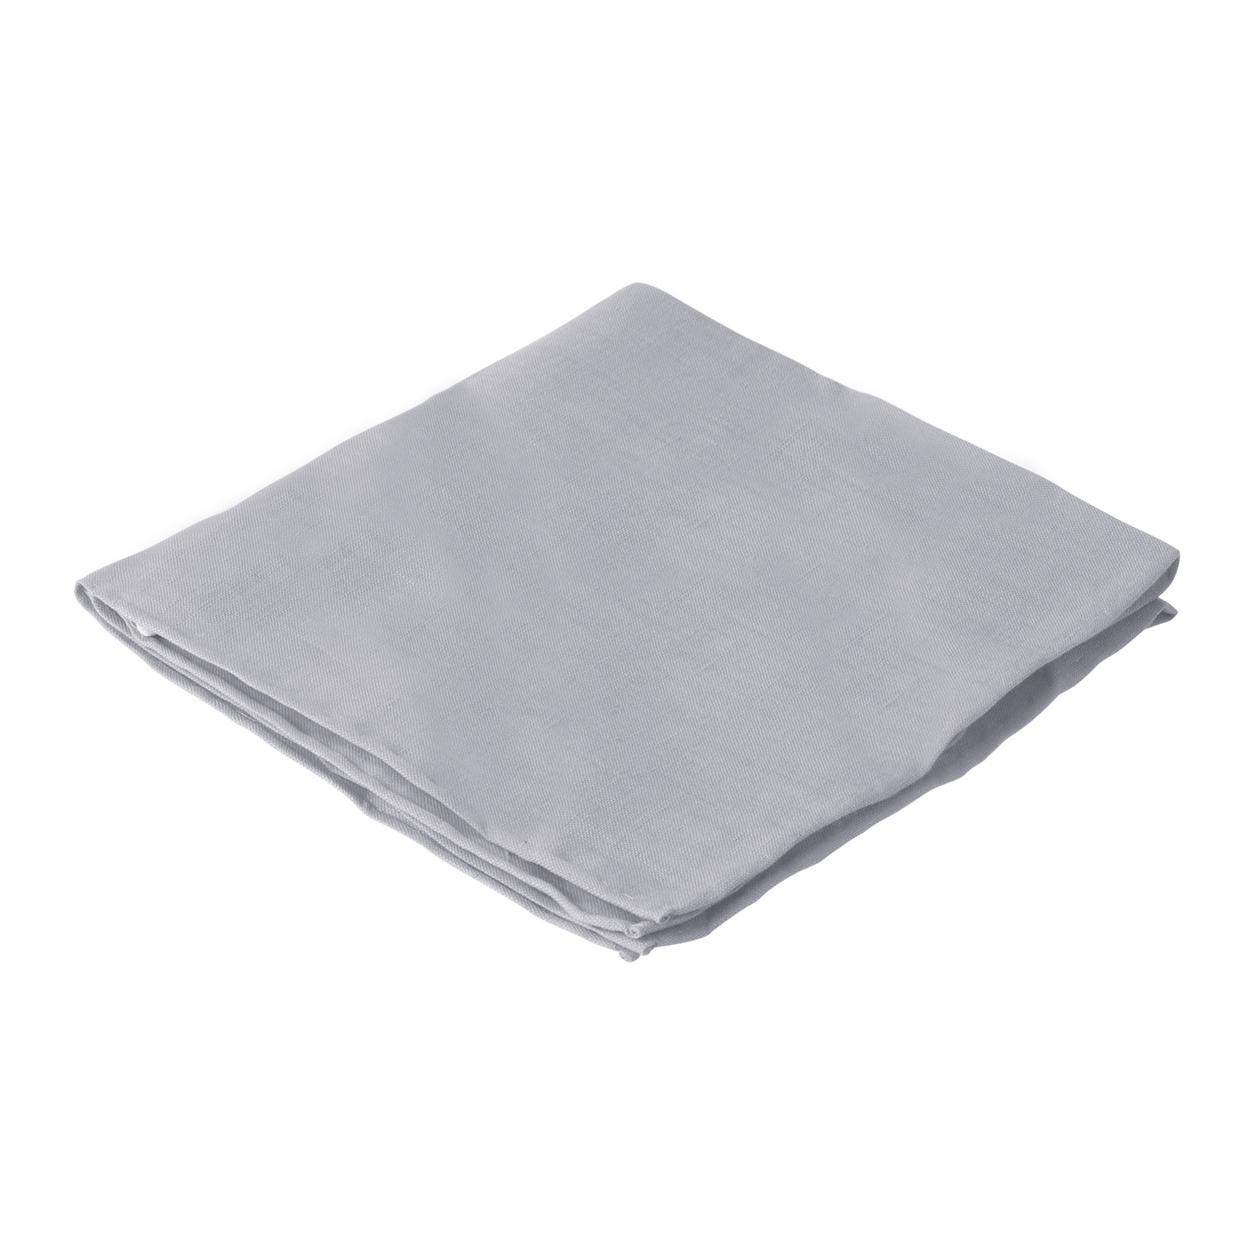 Jacob-Alexander-Linen-Handrolled-15-034-x-15-034-Pocket-Square-Hanky thumbnail 30